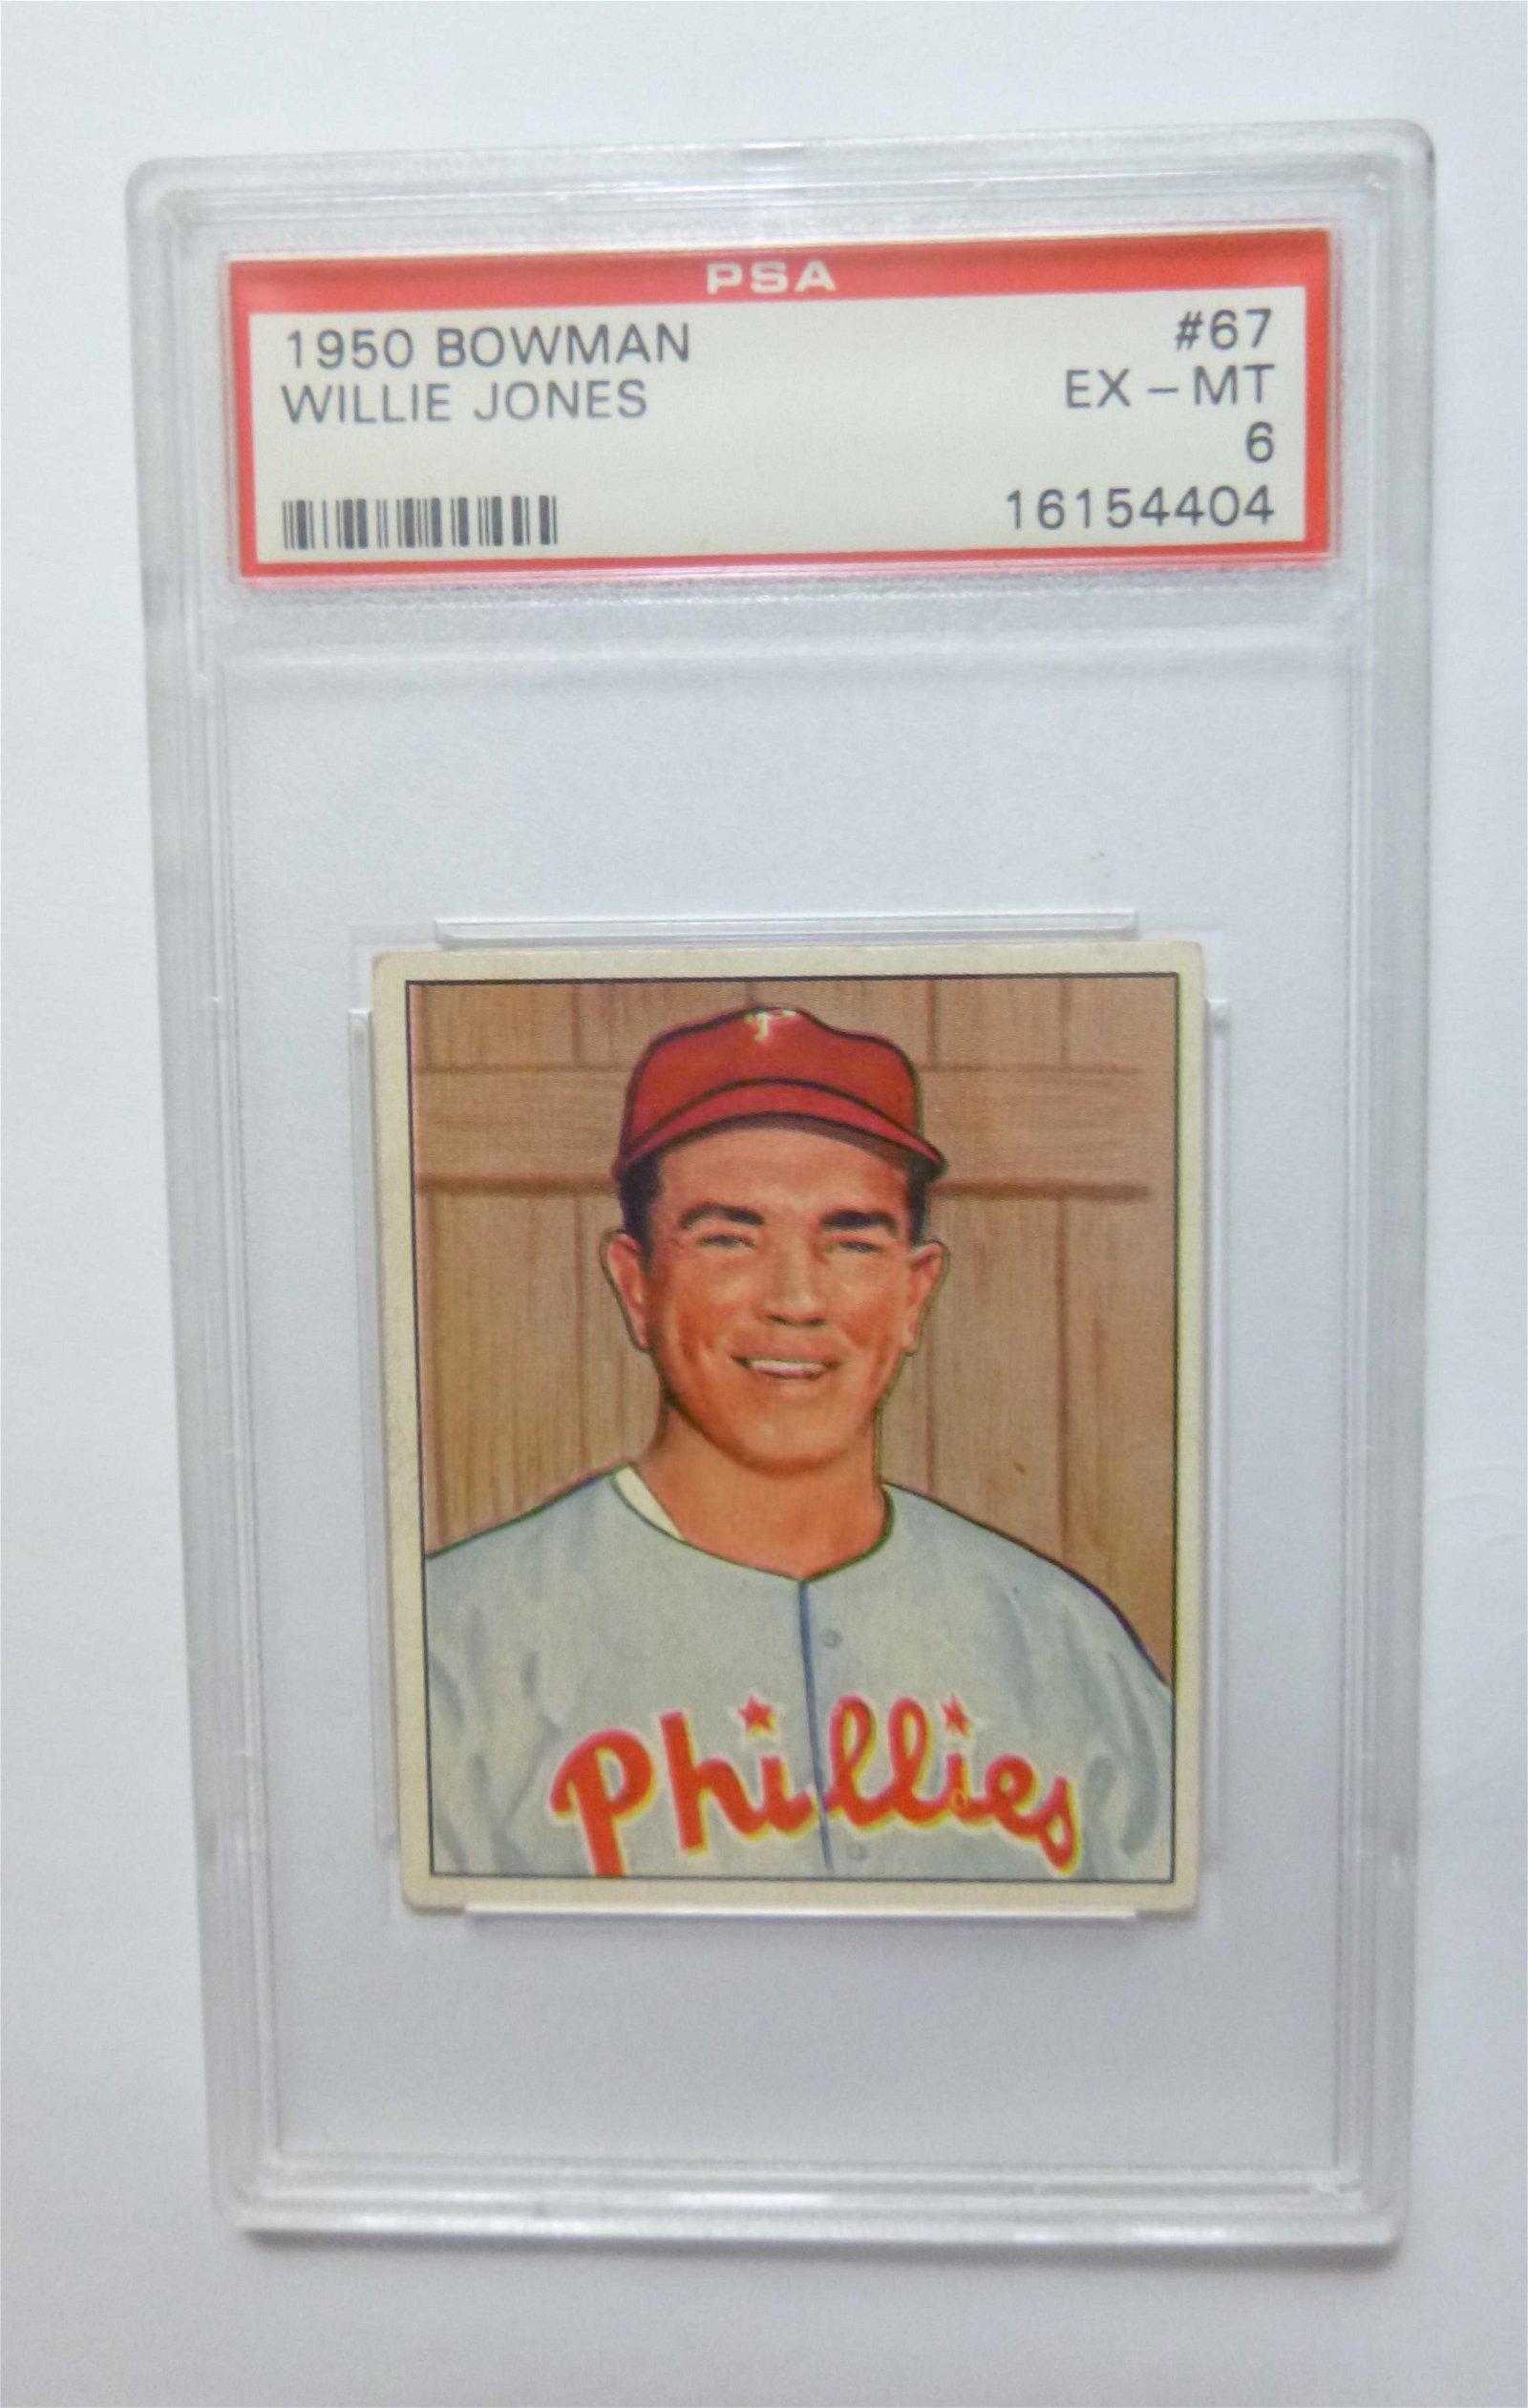 1950 Bowman #67 Willie Jones PSA 6